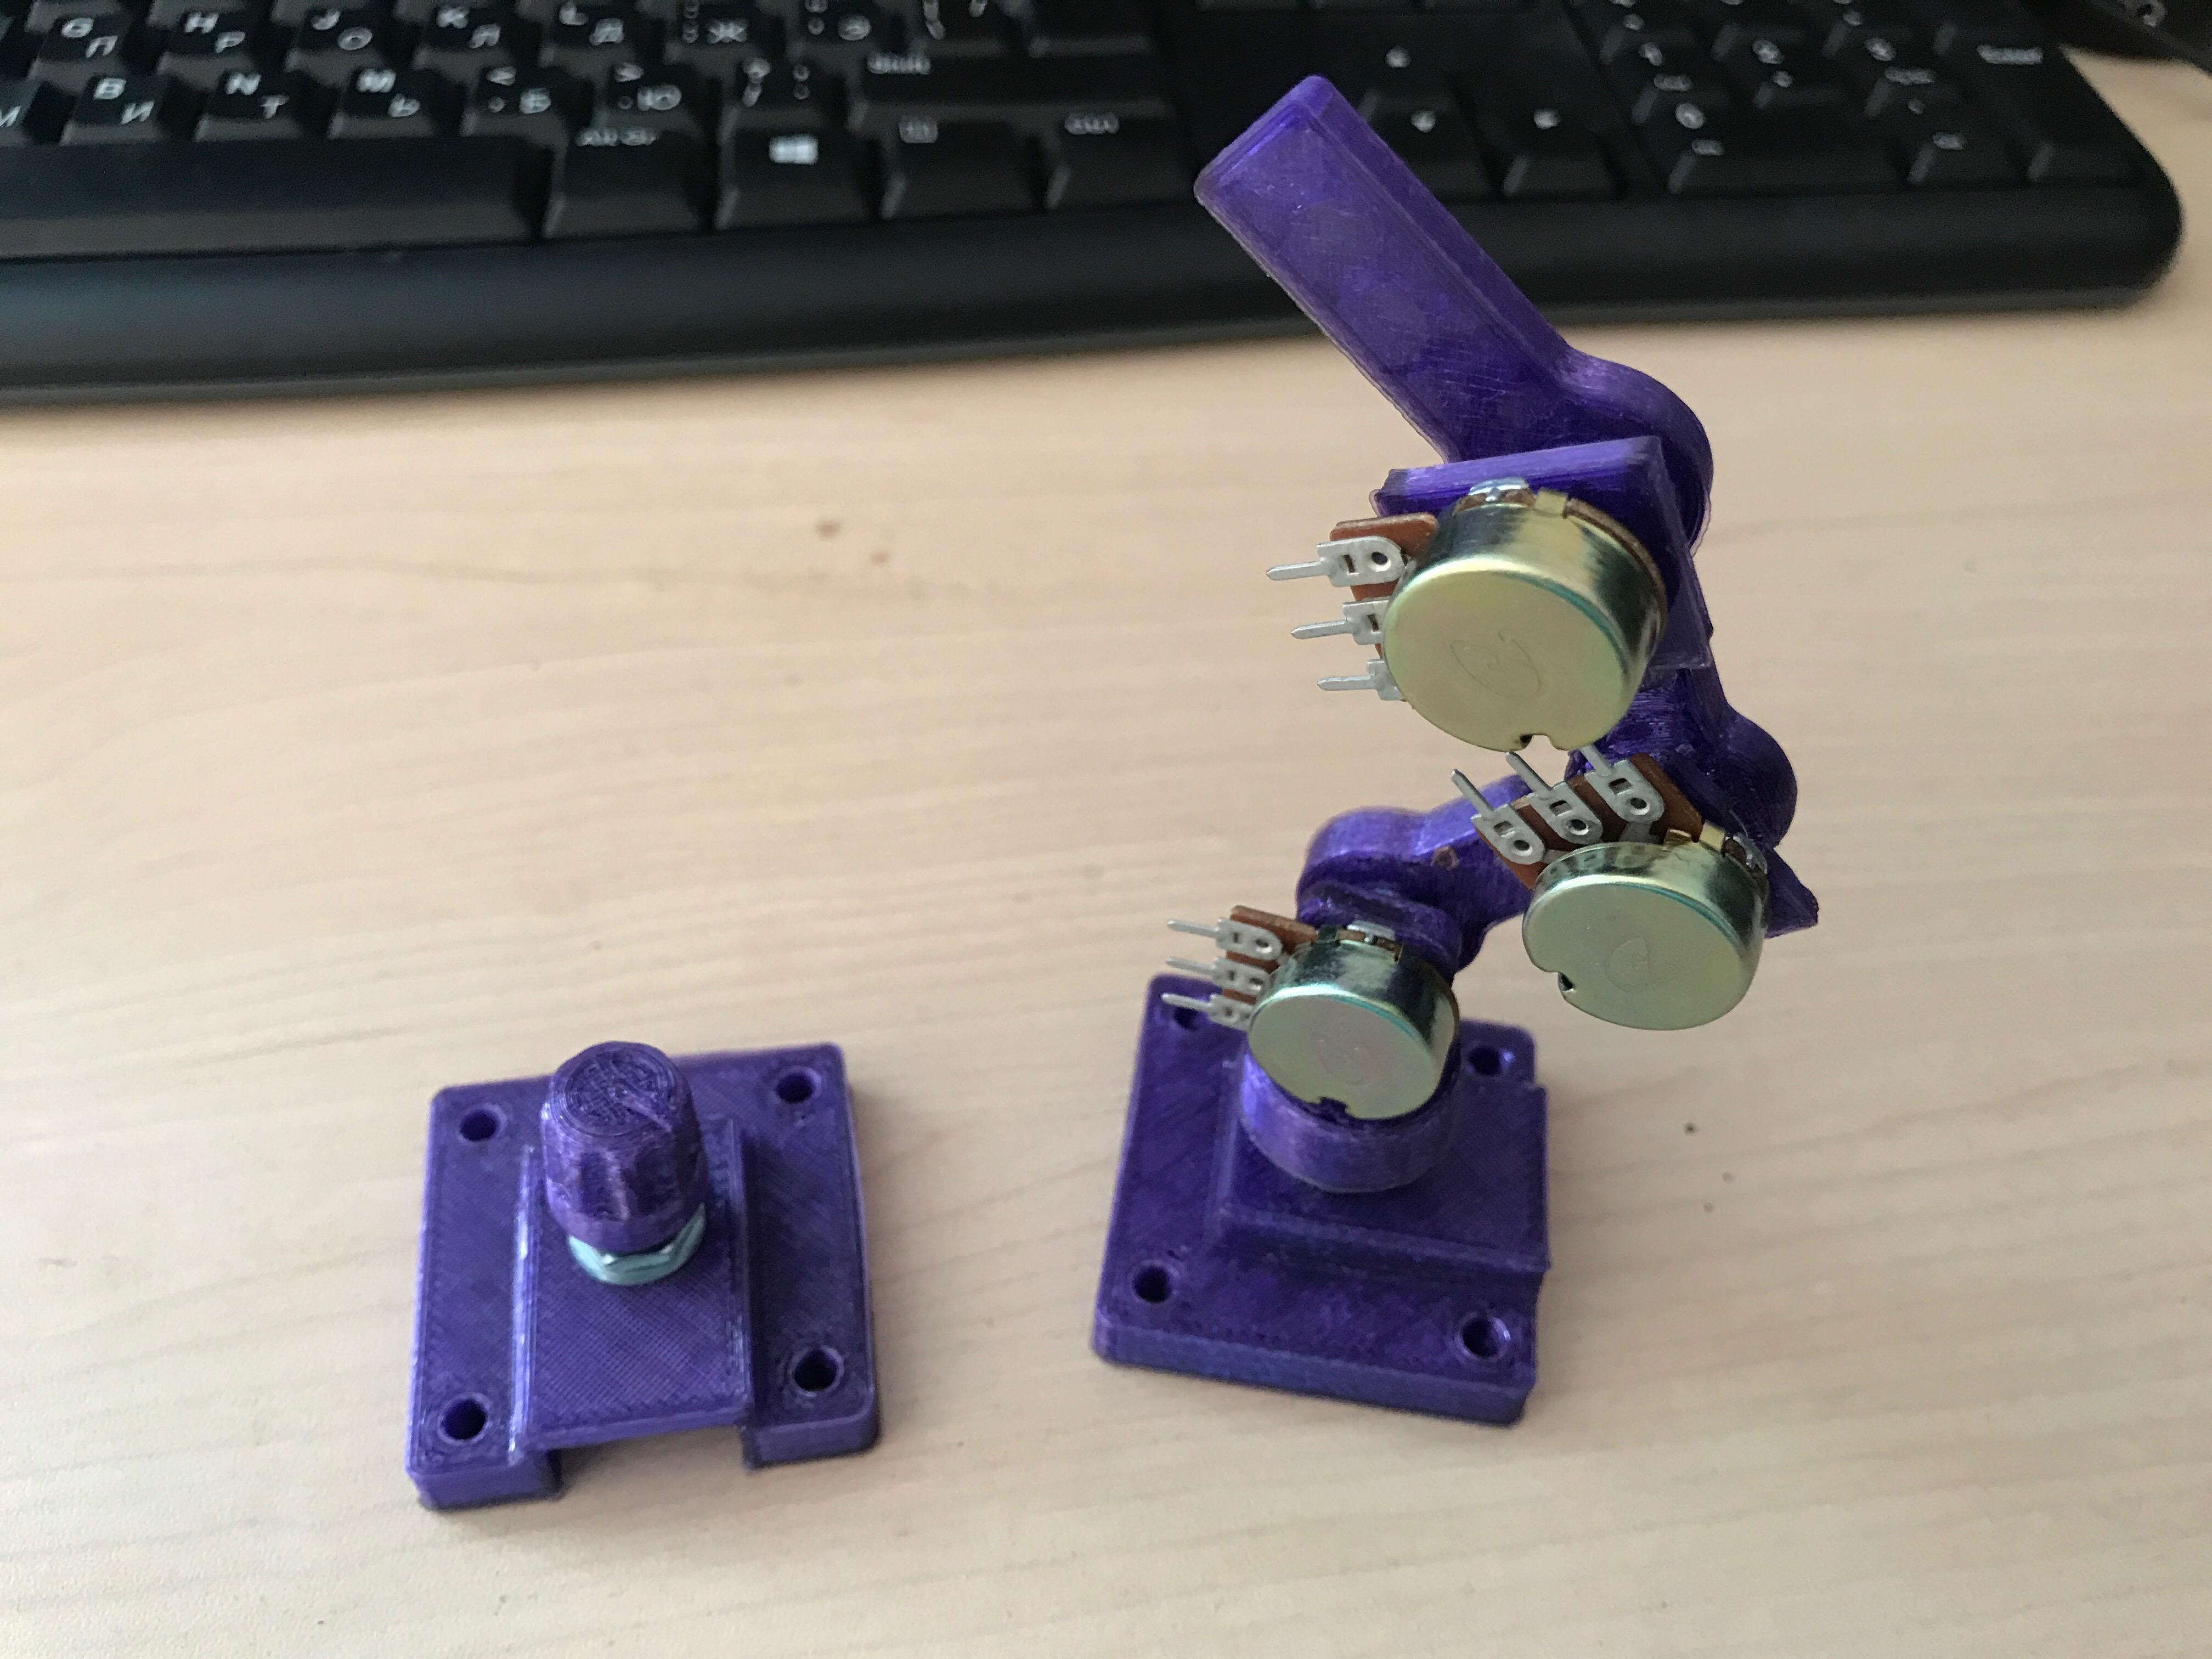 Joystick for robotic arm (potentiometer) by igor2890 - Thingiverse